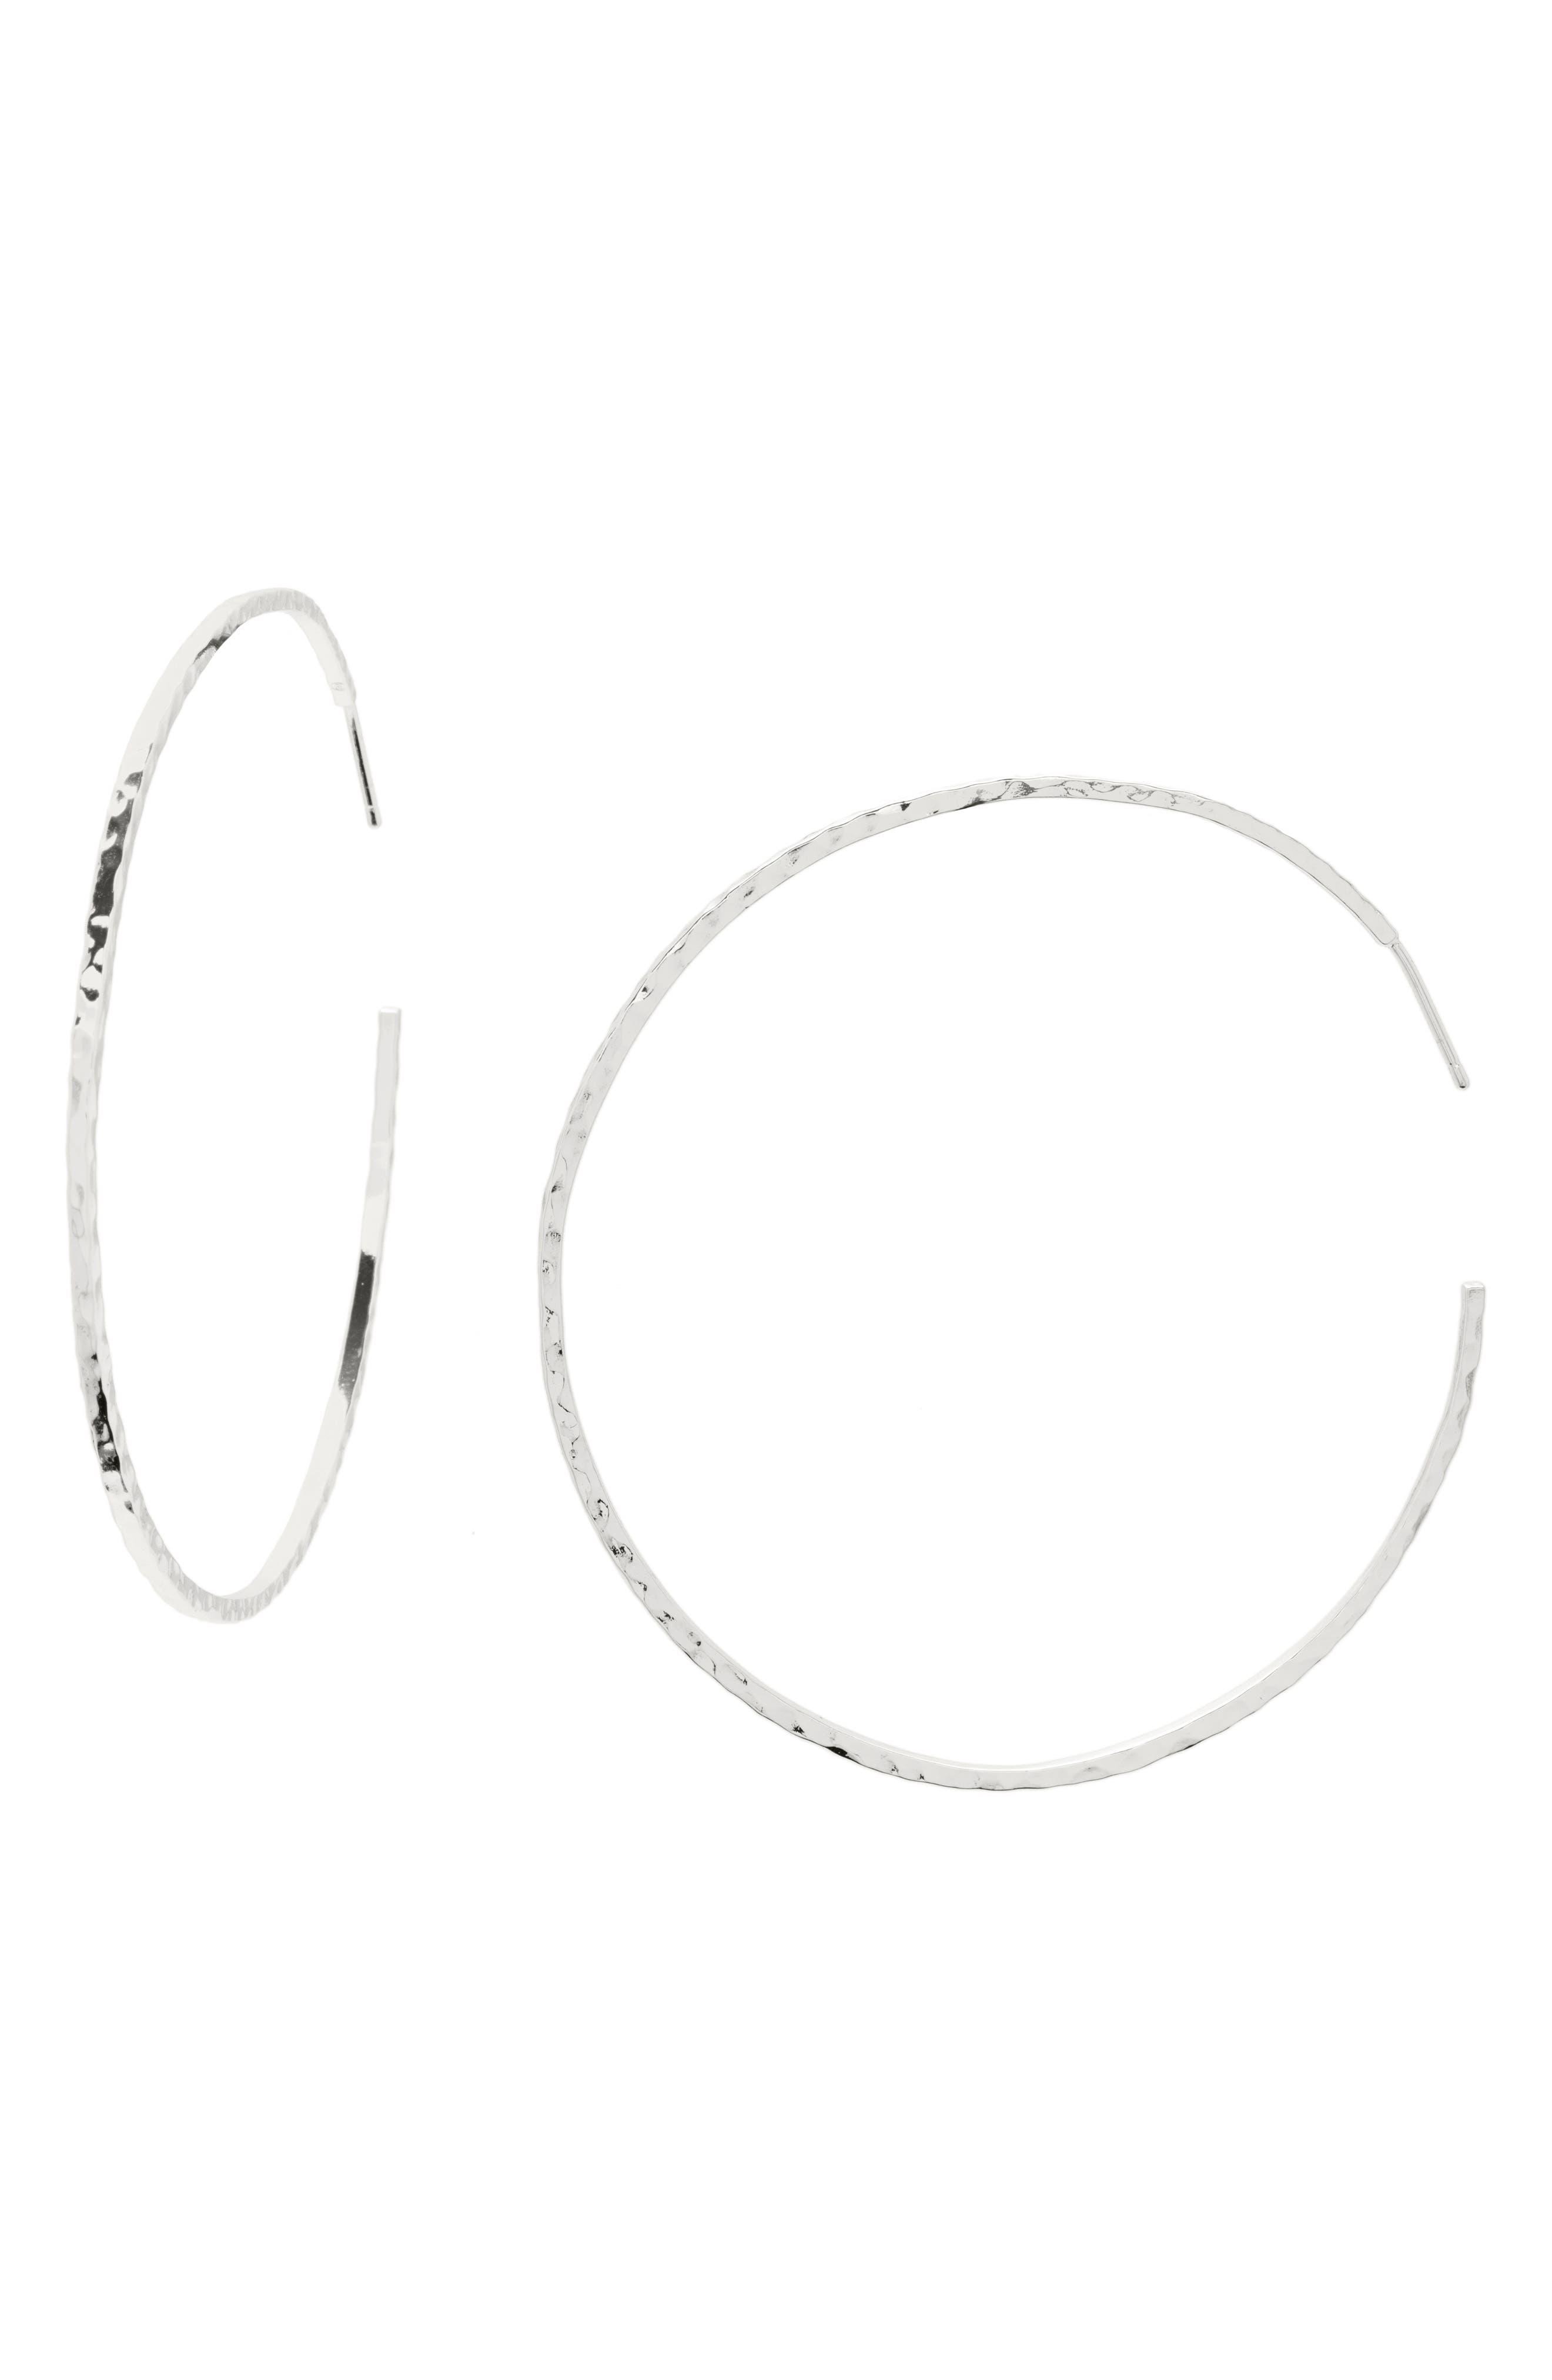 GORJANA, Taner Extra Large Hoop Earrings, Main thumbnail 1, color, SILVER